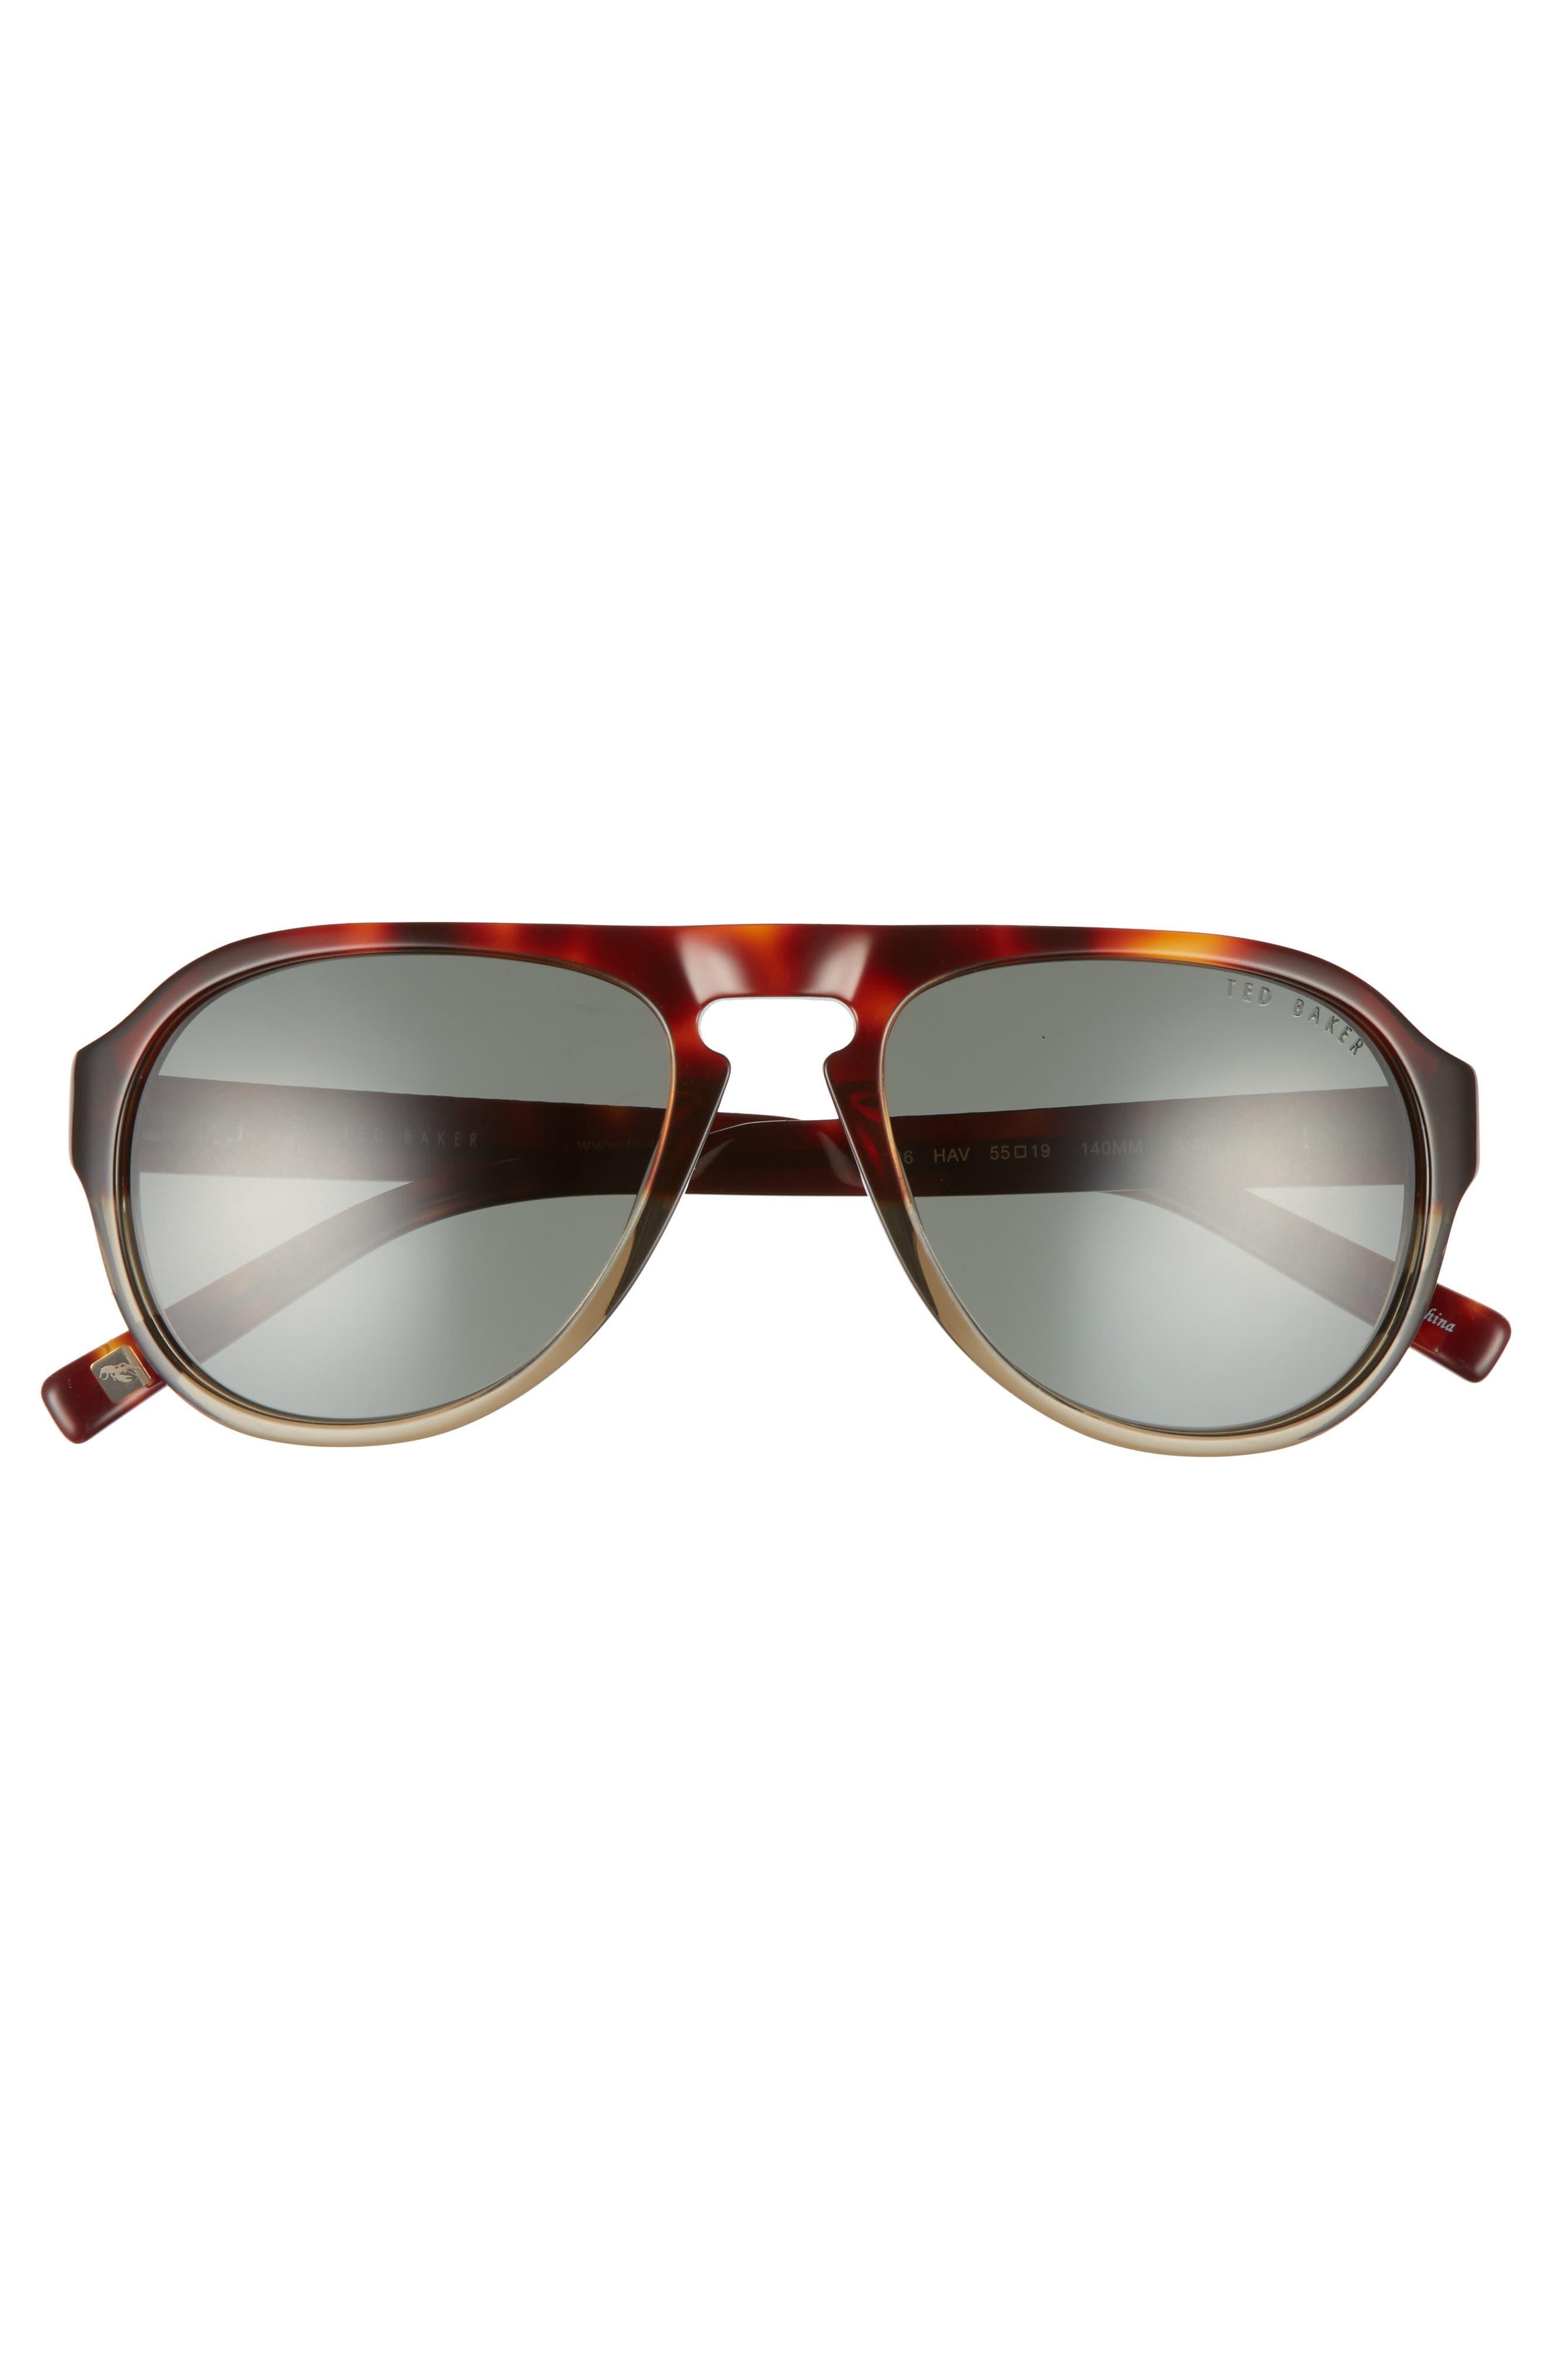 55mm Polarized Aviator Sunglasses,                             Alternate thumbnail 2, color,                             241